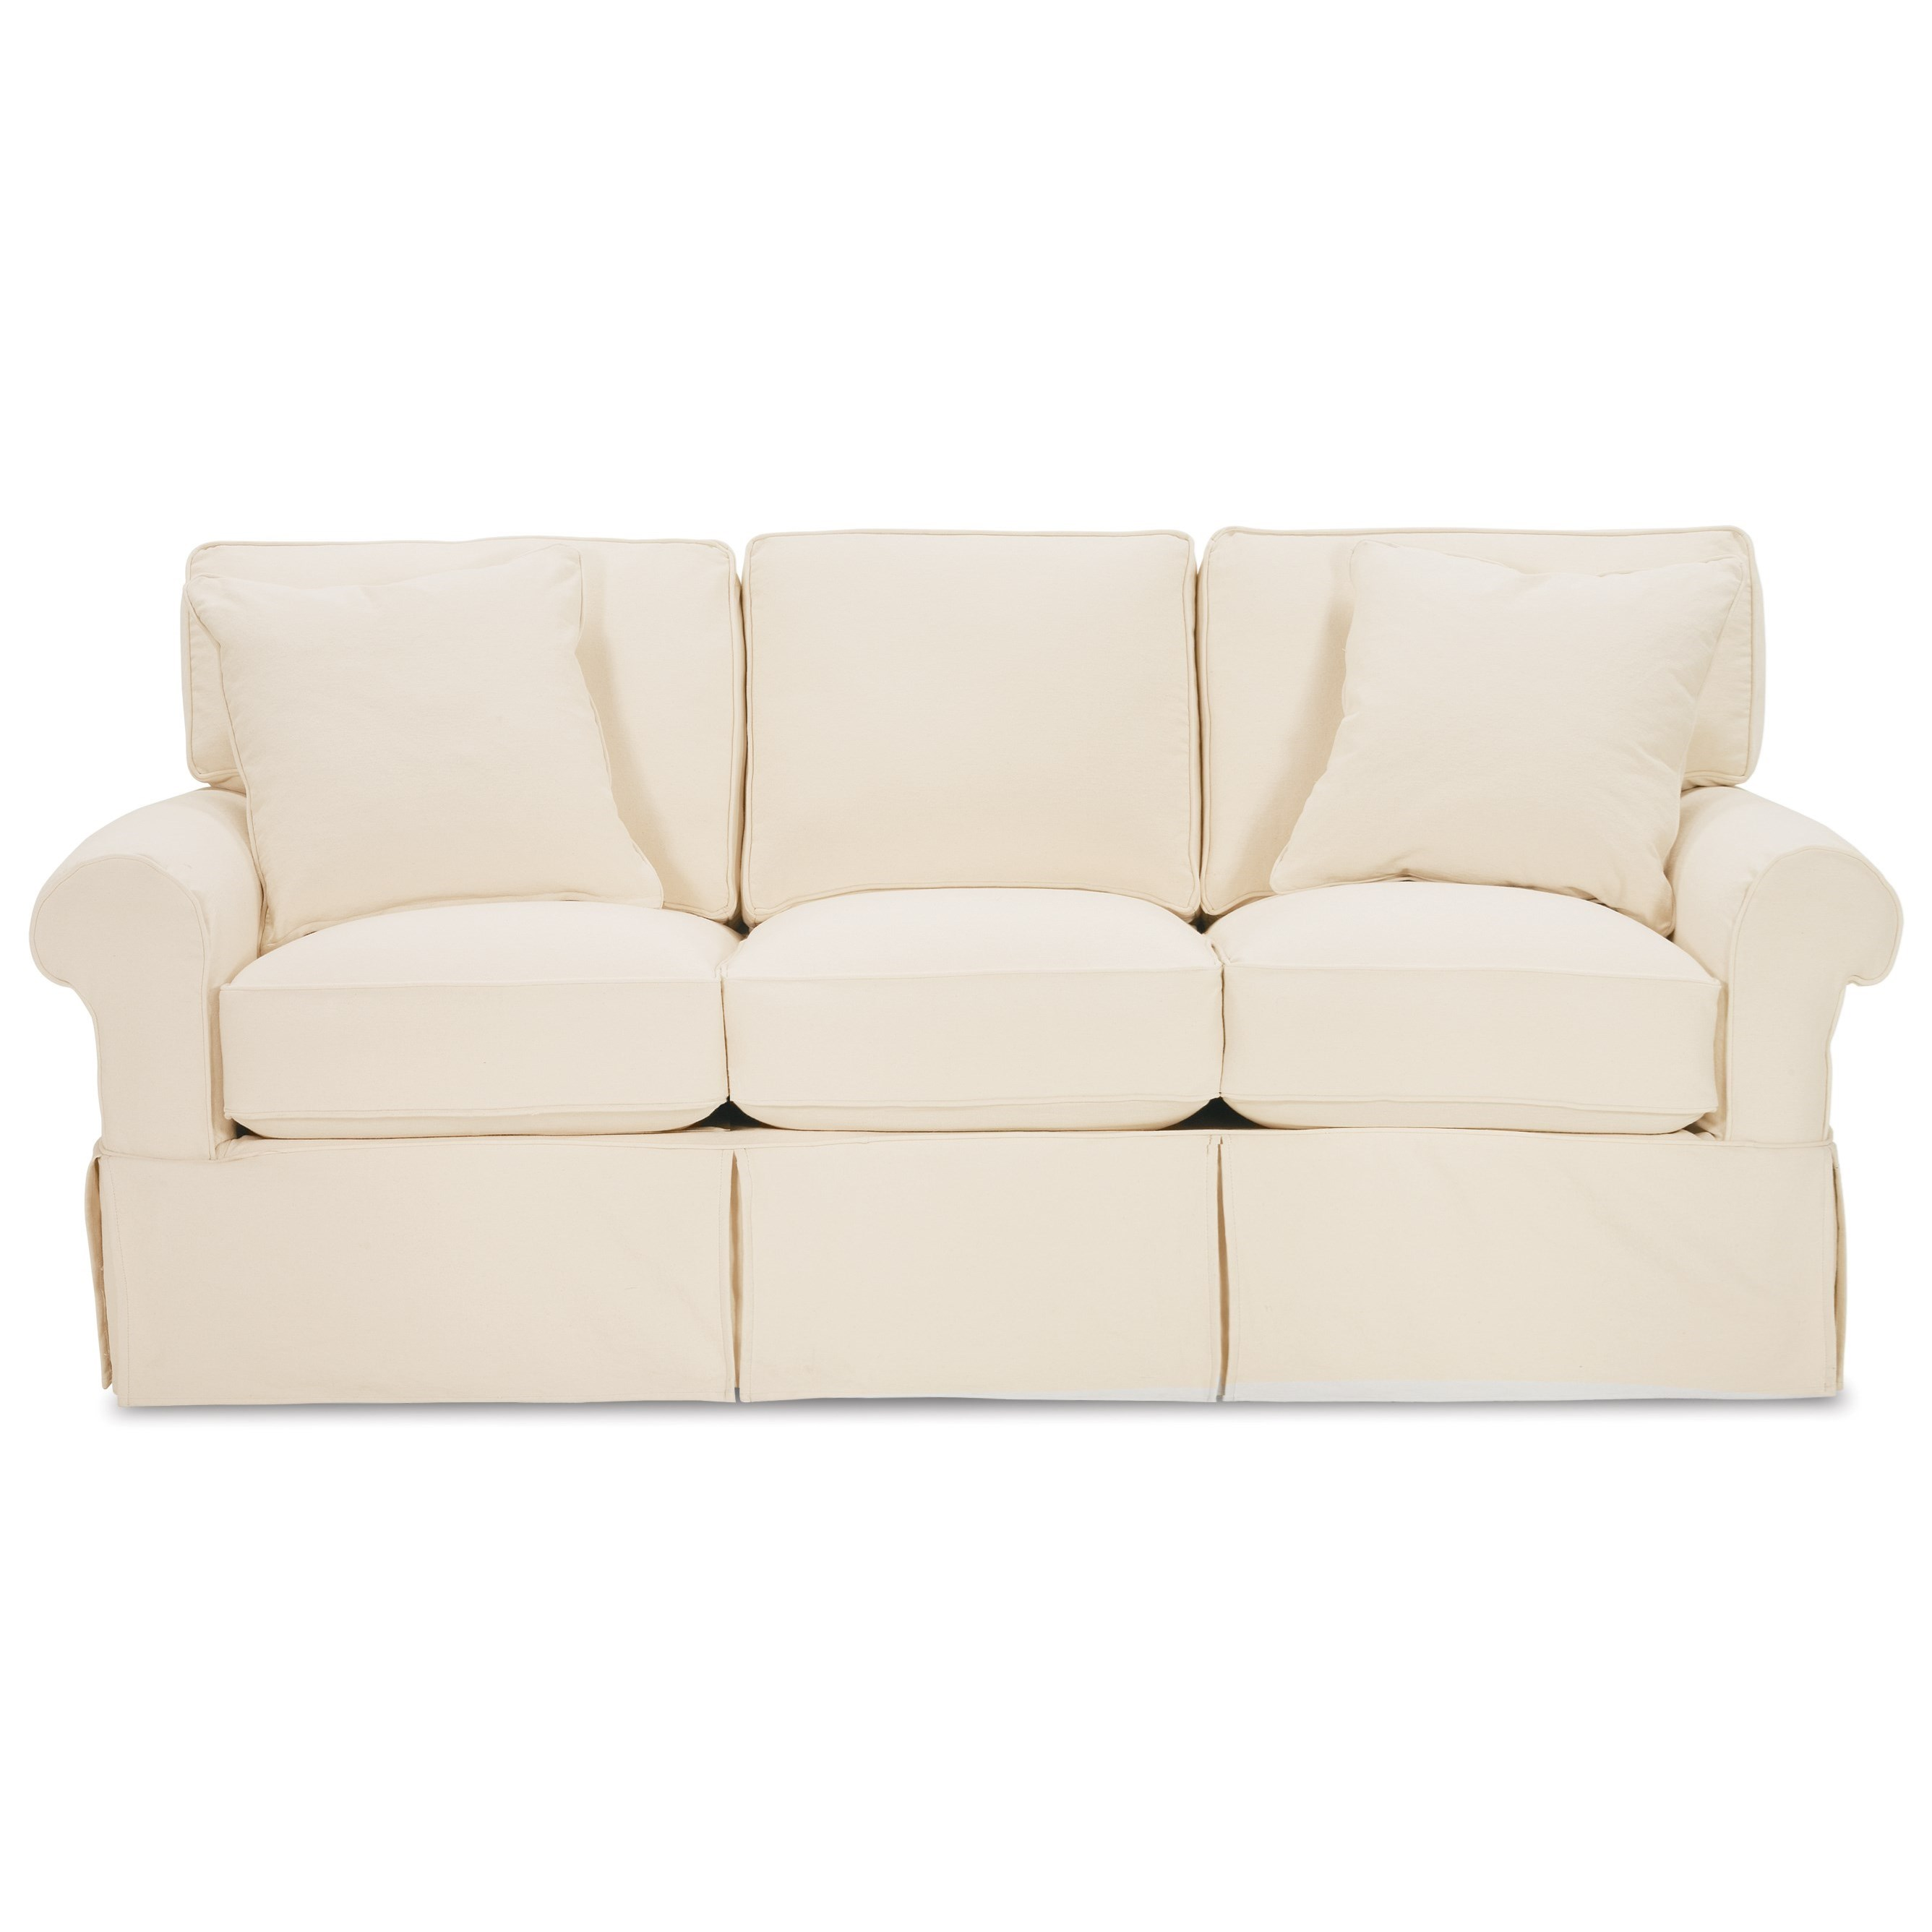 Rowe Nantucket  Sofa Sleeper - Item Number: A919Q